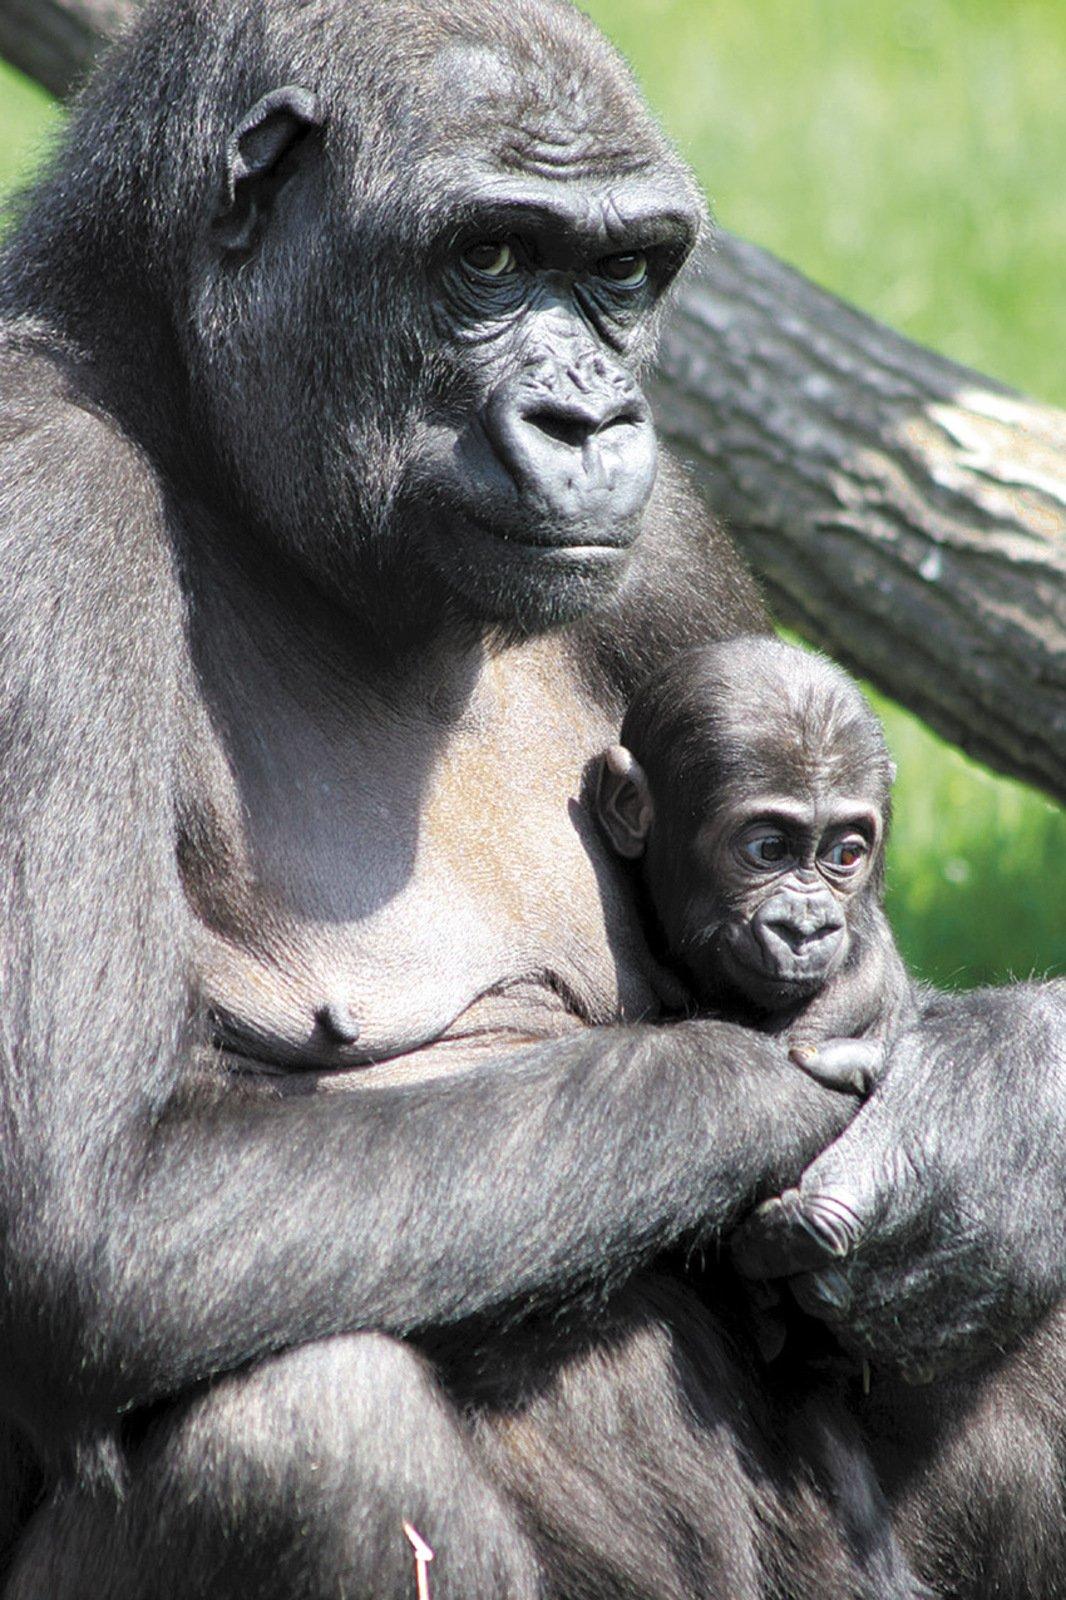 Moja, ještě jako miminko, s matkou Kijivou.